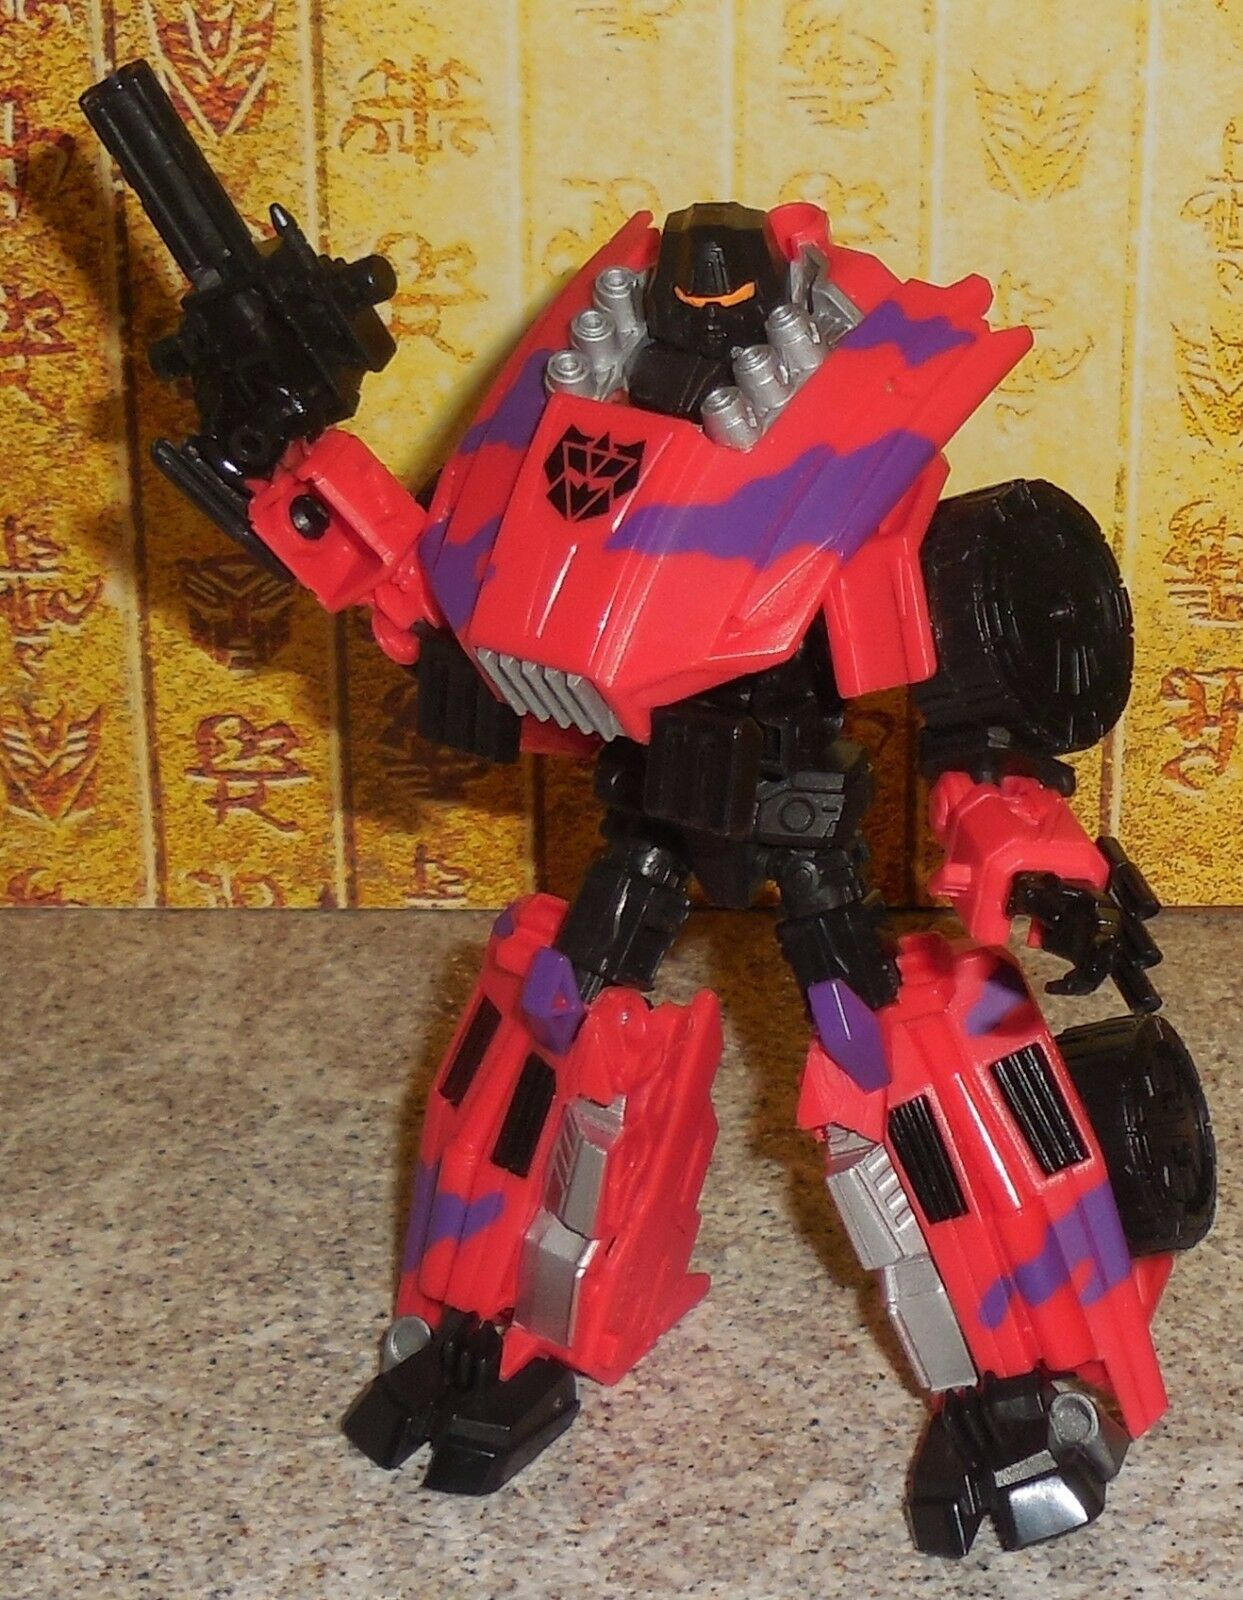 Transformers Generation 2 SWINDLE Complete figure for Decepticon Bruticus